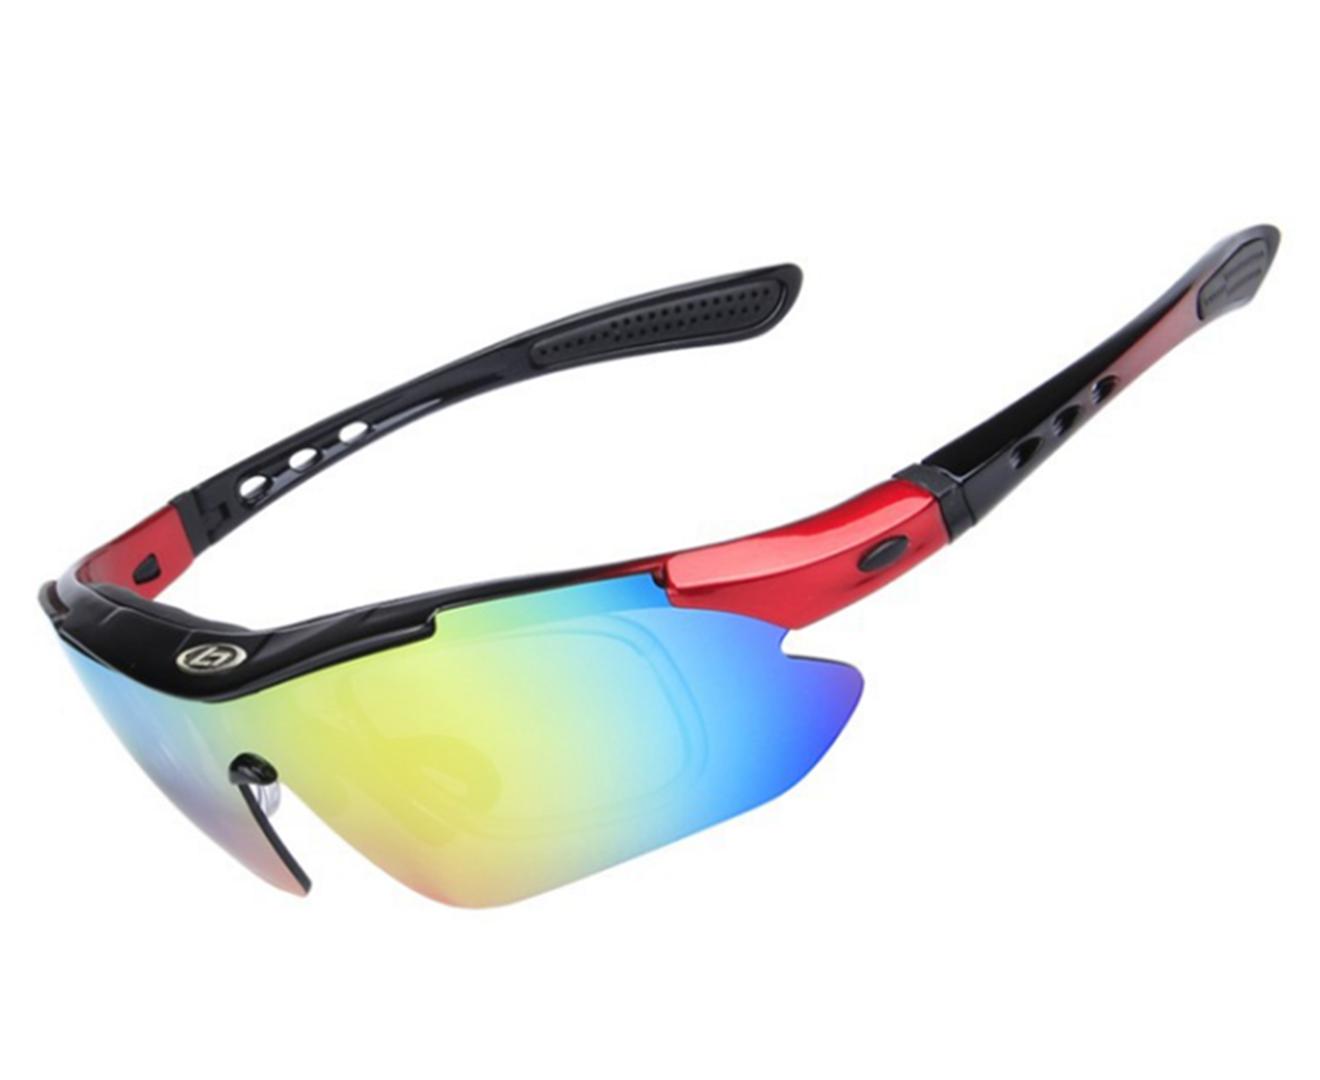 Outdoor Sports Polarized Night Vision Eyeglasses Riding Eyeglasses 5-Piece Suit - 2